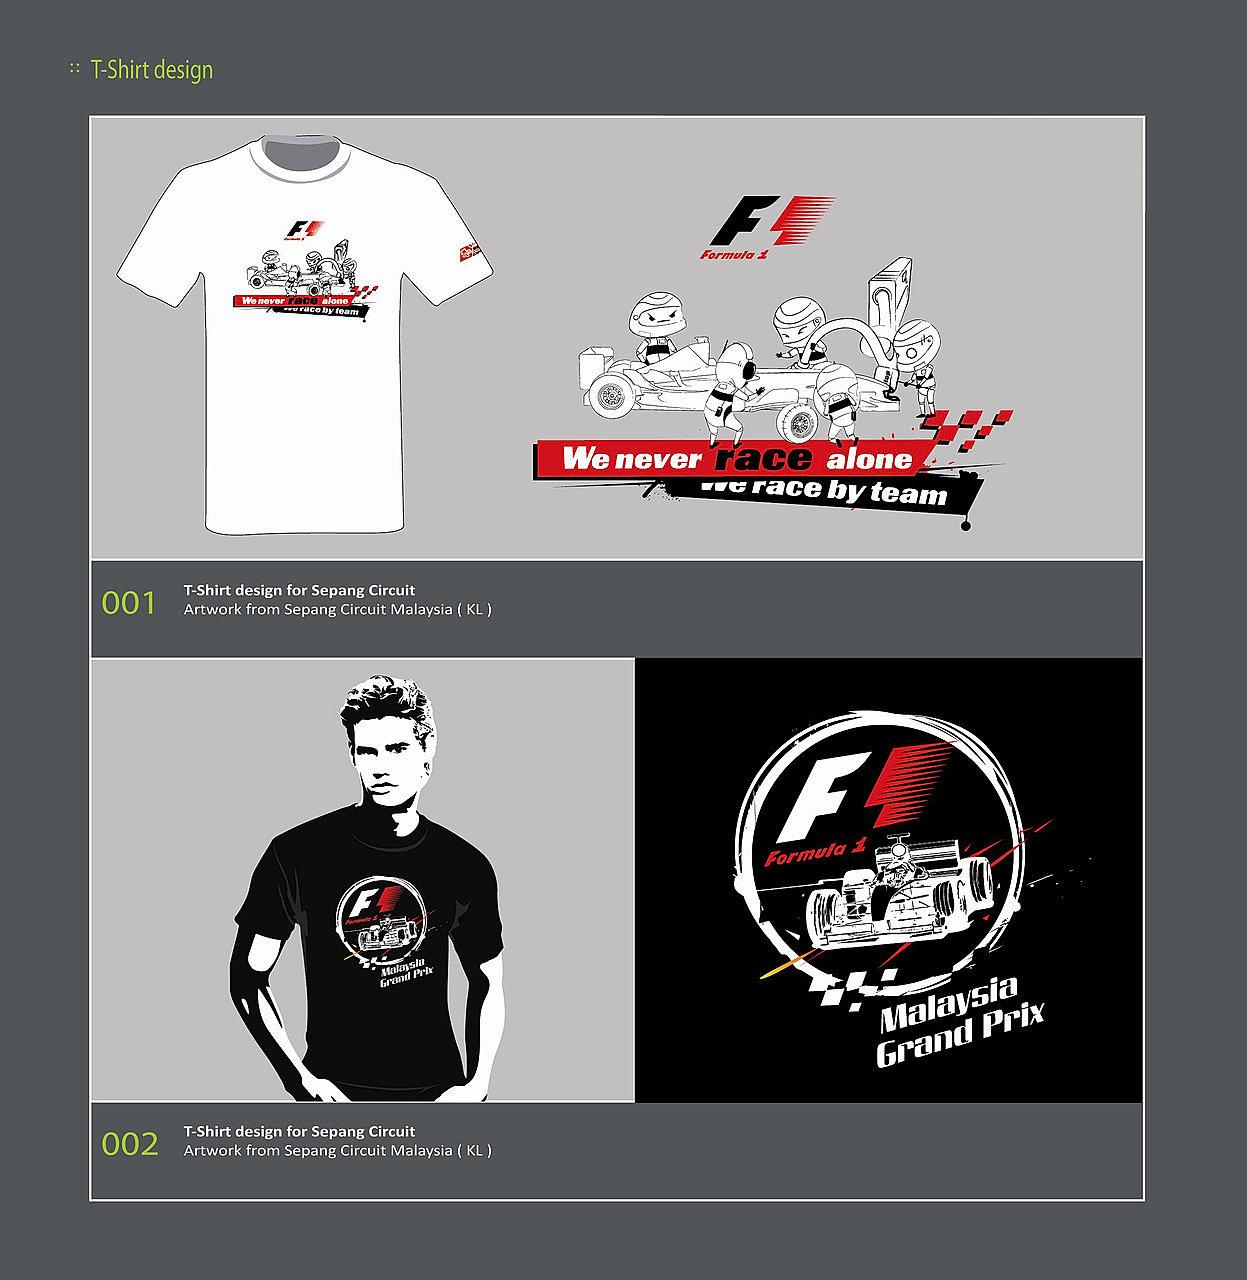 Shirt design online malaysia - T Shirt Design For Malaysia